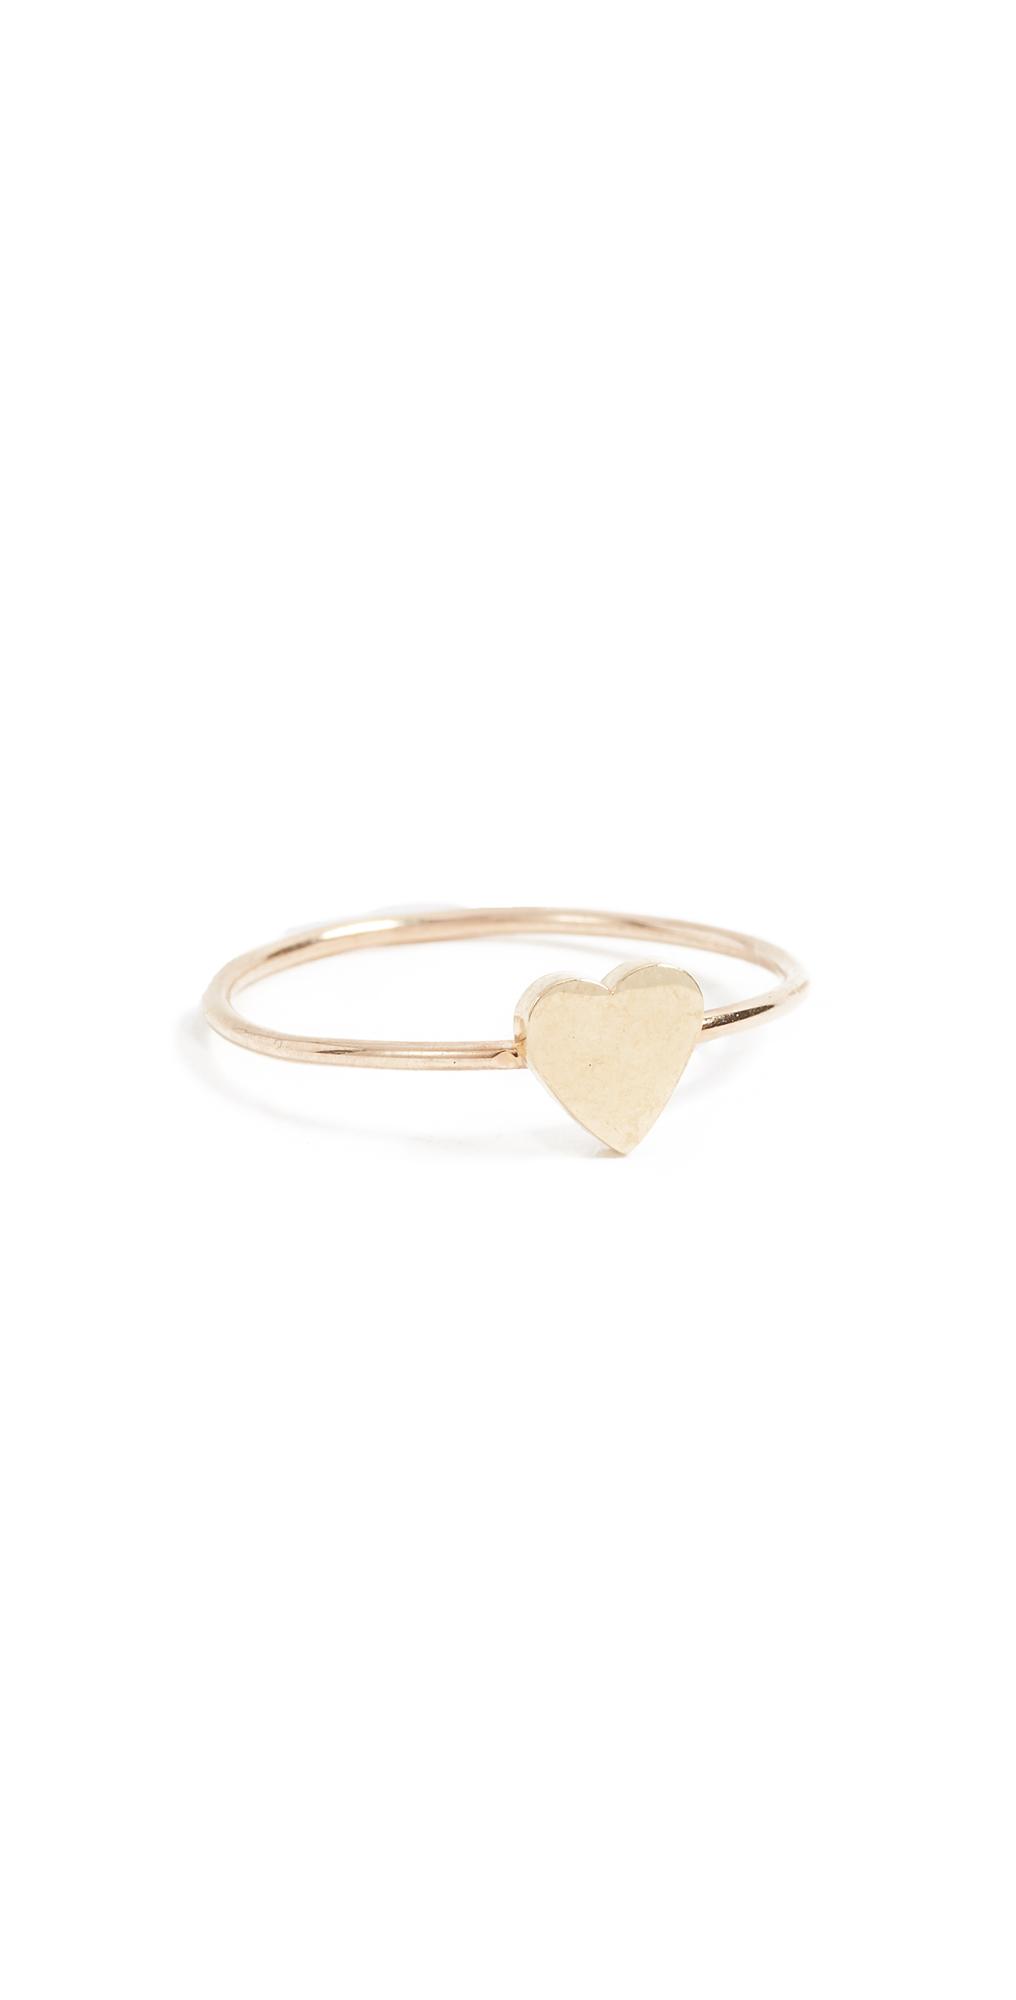 18k Gold Mini Heart Ring